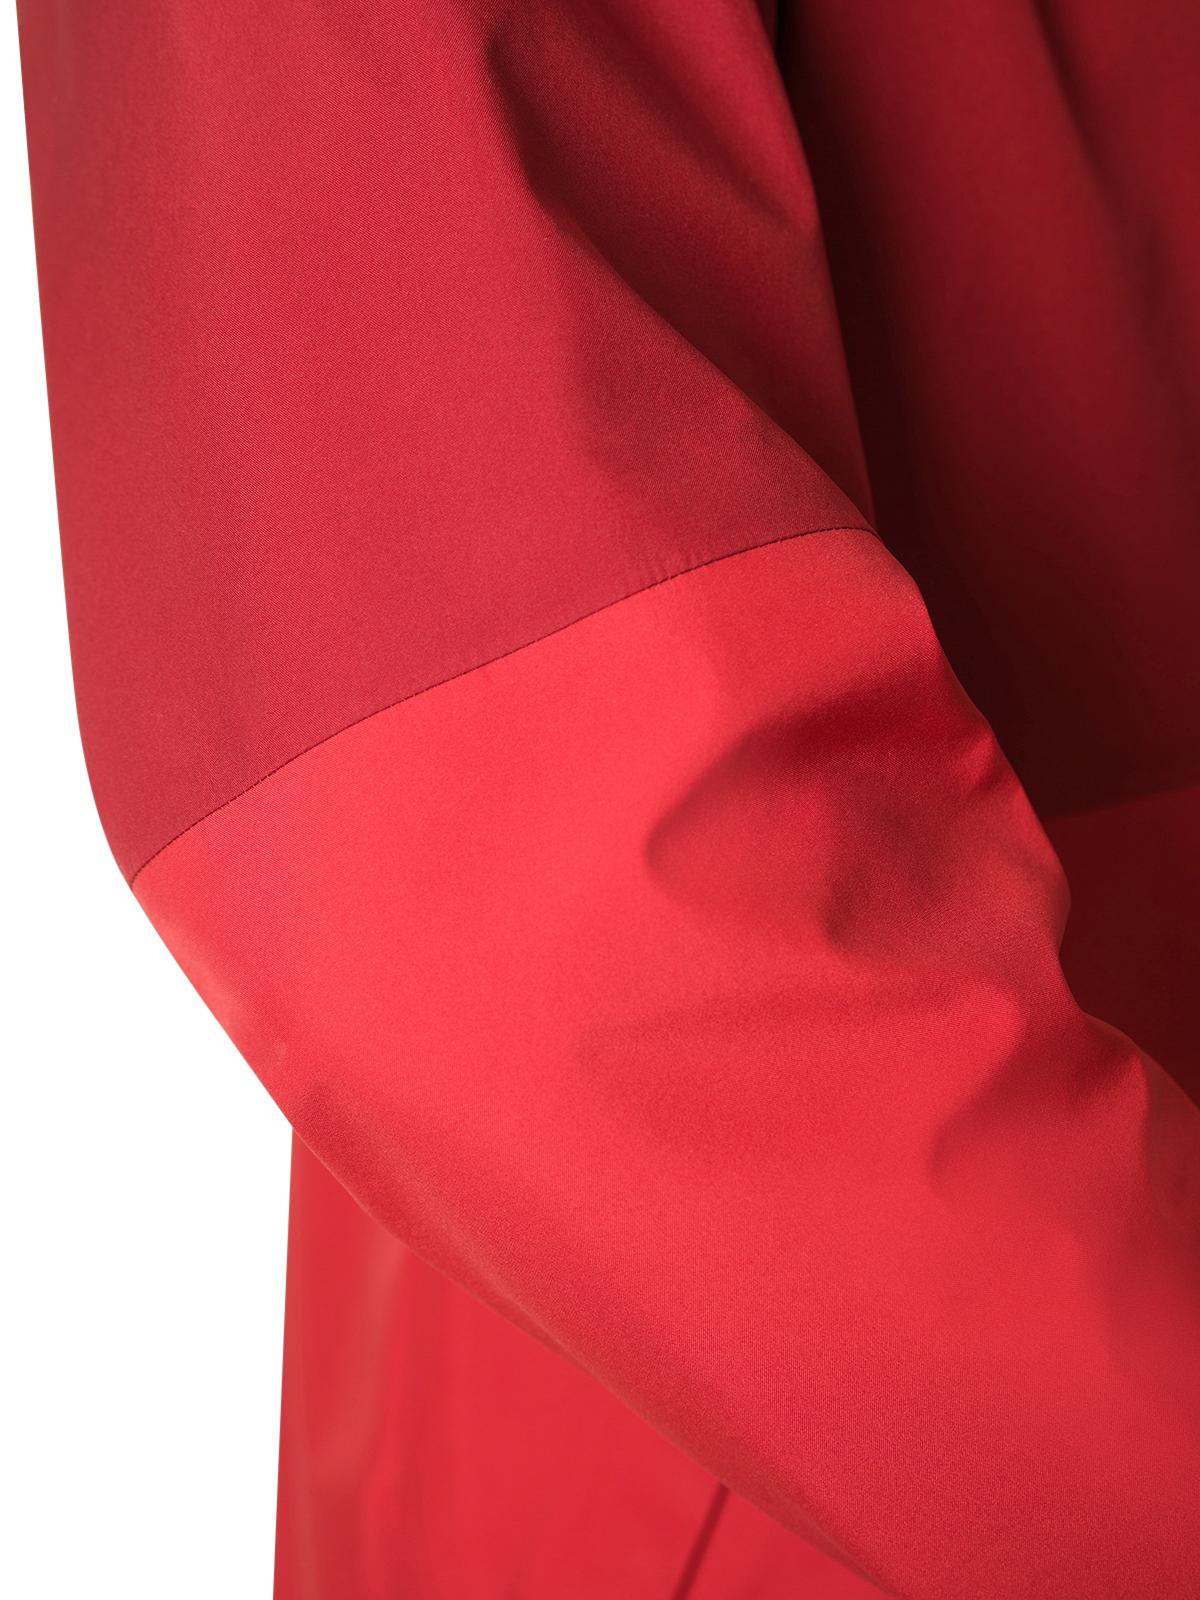 berghaus-ROSVIK articulated sleeves